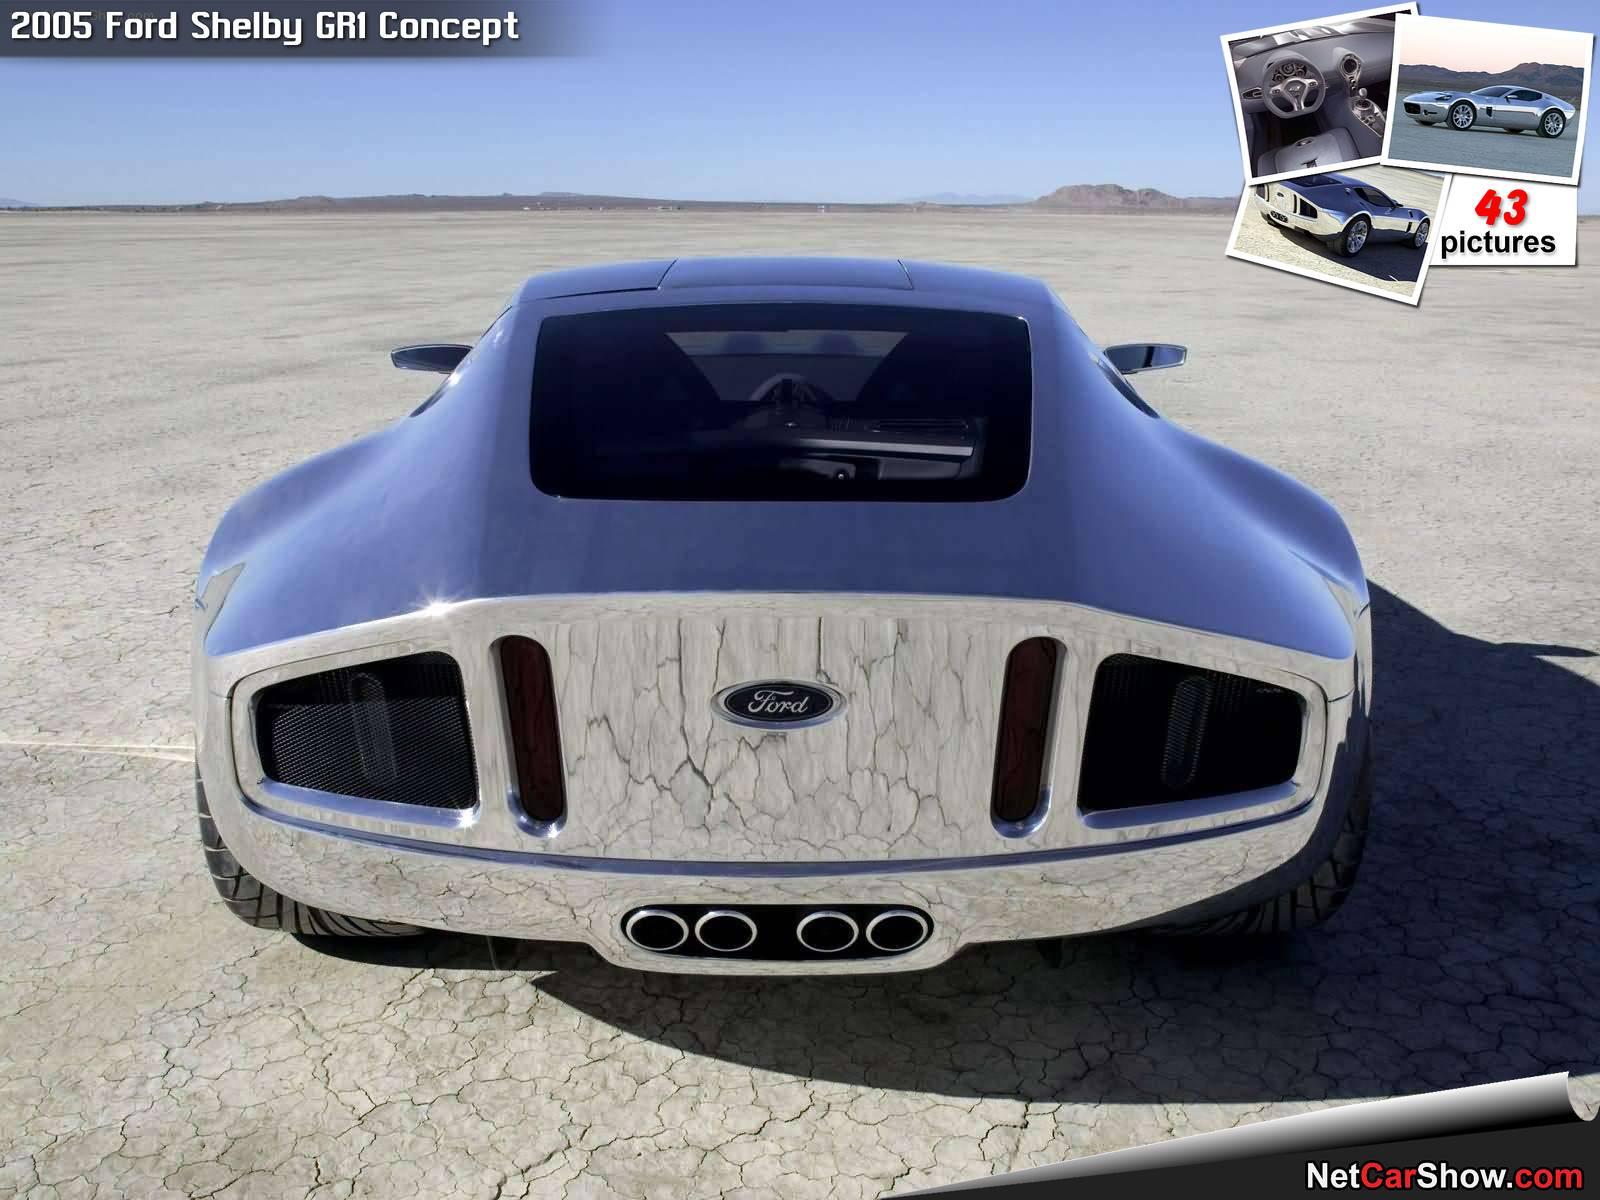 Ford-Shelby_GR1_Concept_2005_1600x1200_wallpaper_10.jpg